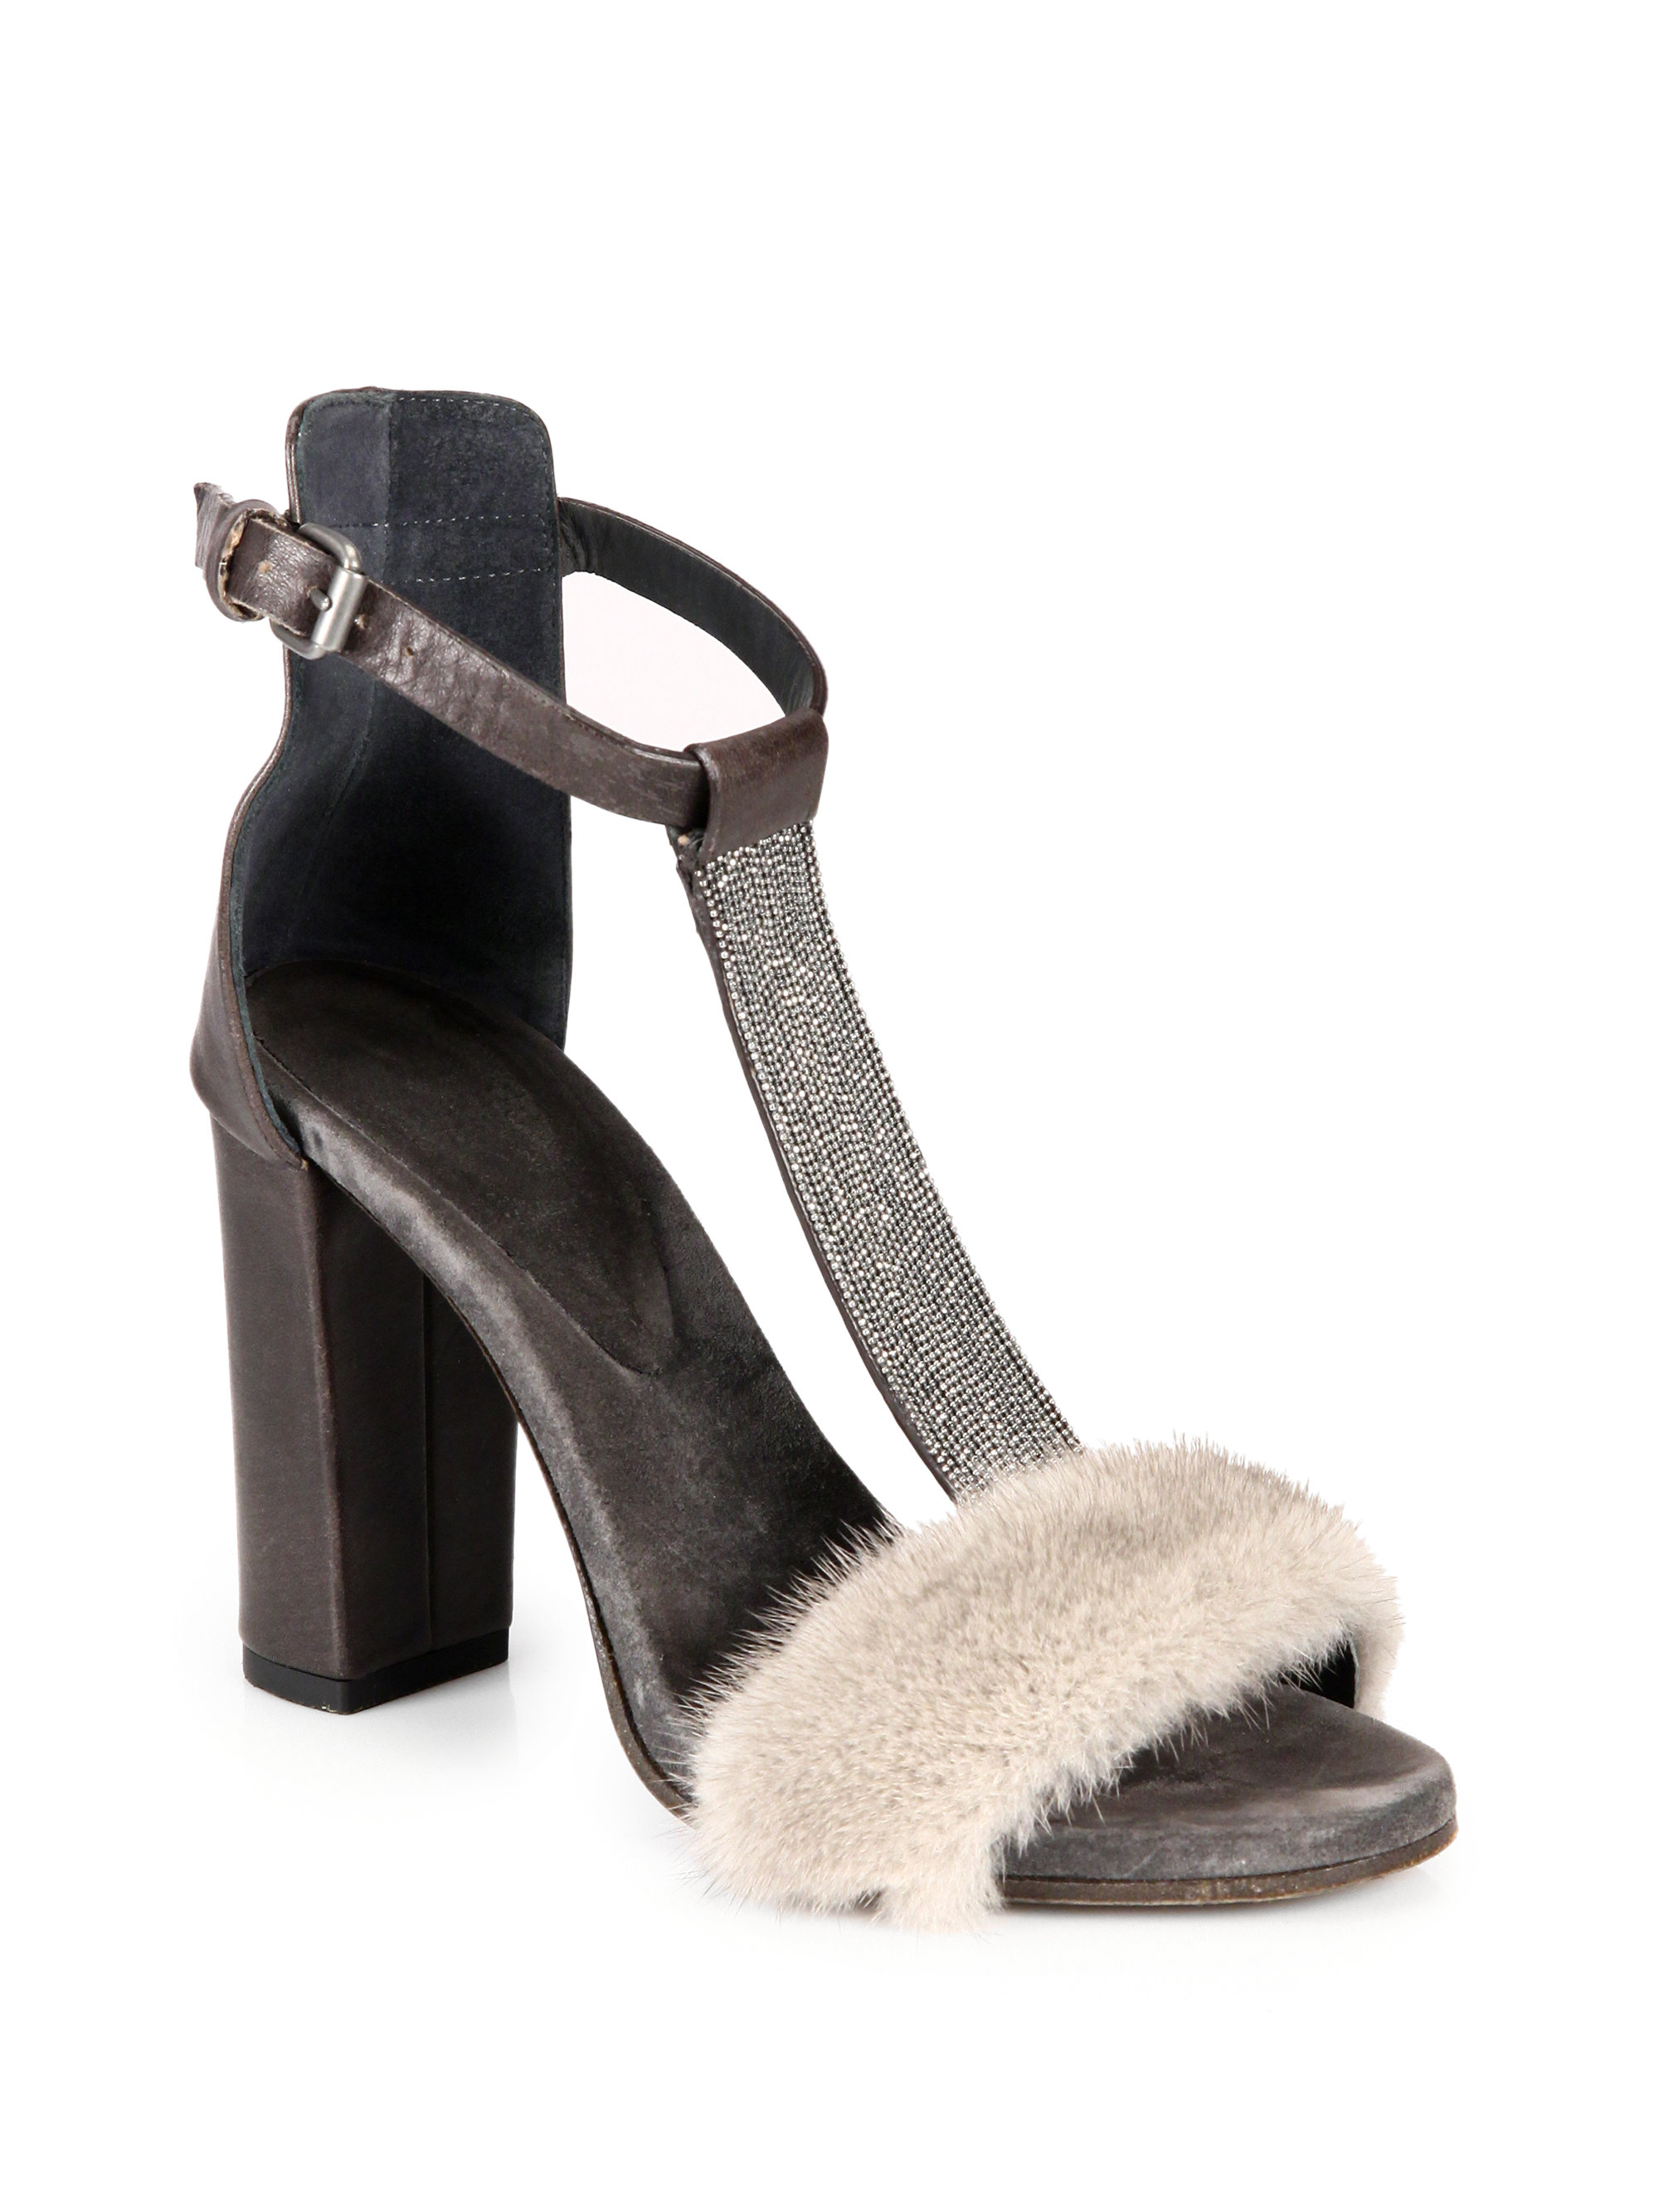 922254ed1d46 Lyst - Brunello Cucinelli Monili Mink Fur Beaded Leather Tstrap ...